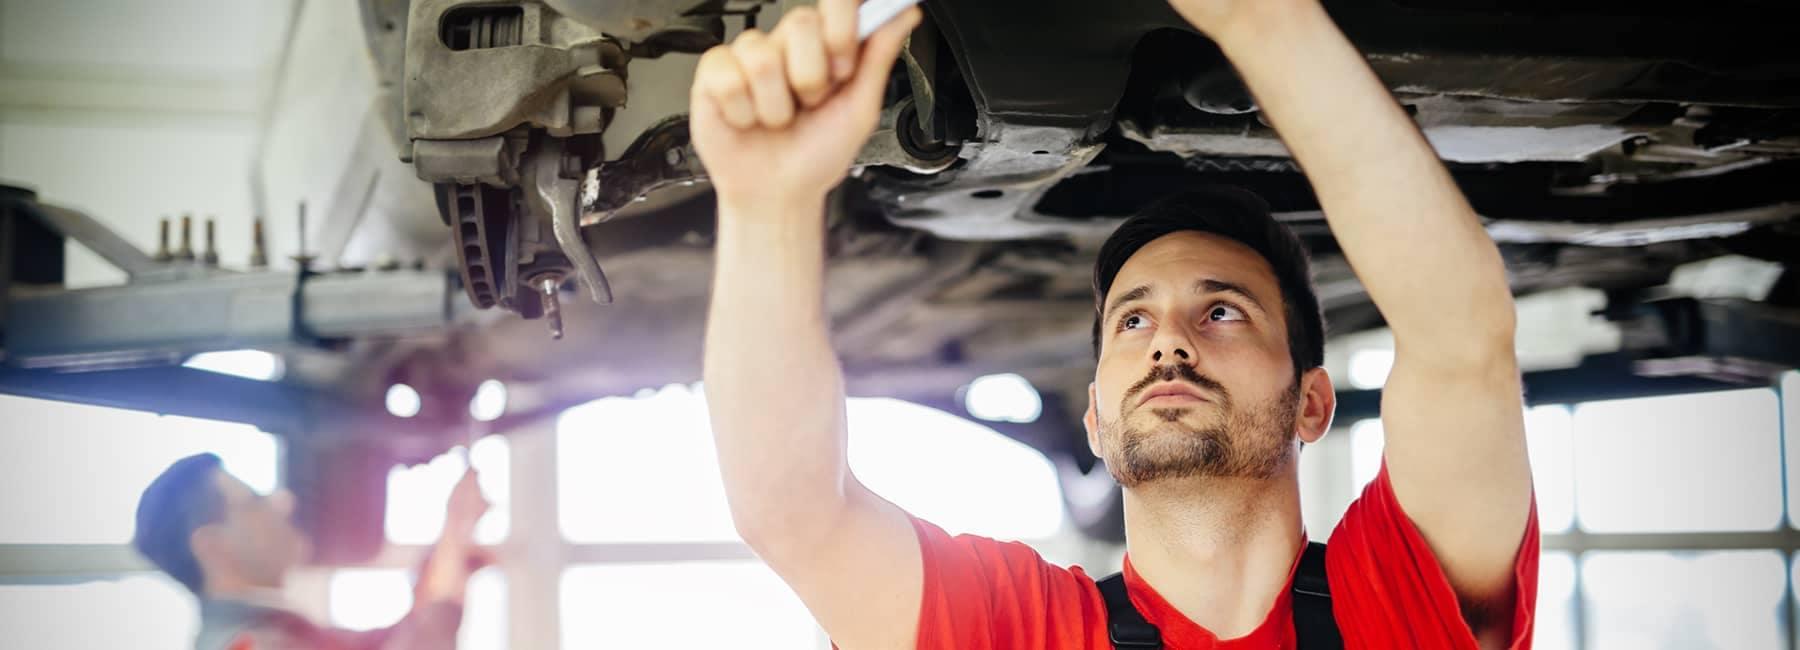 mechanic under car on car rack